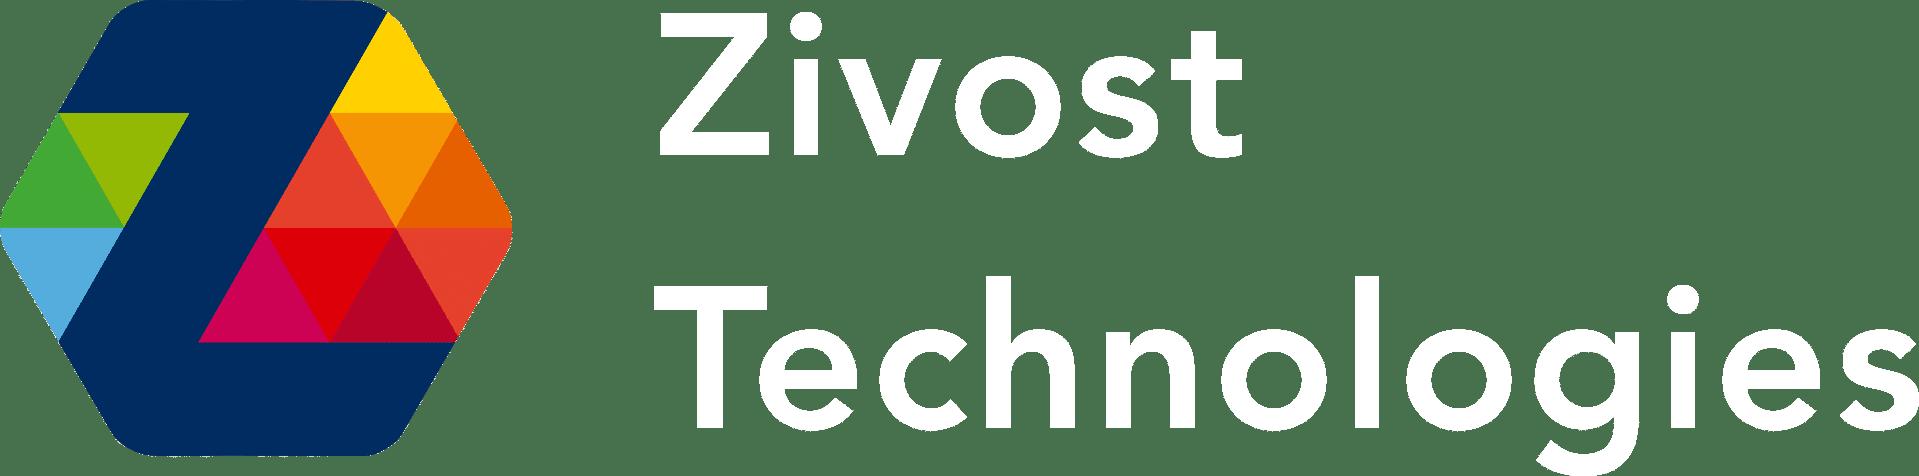 Zivost Technologies Pvt. Ltd.